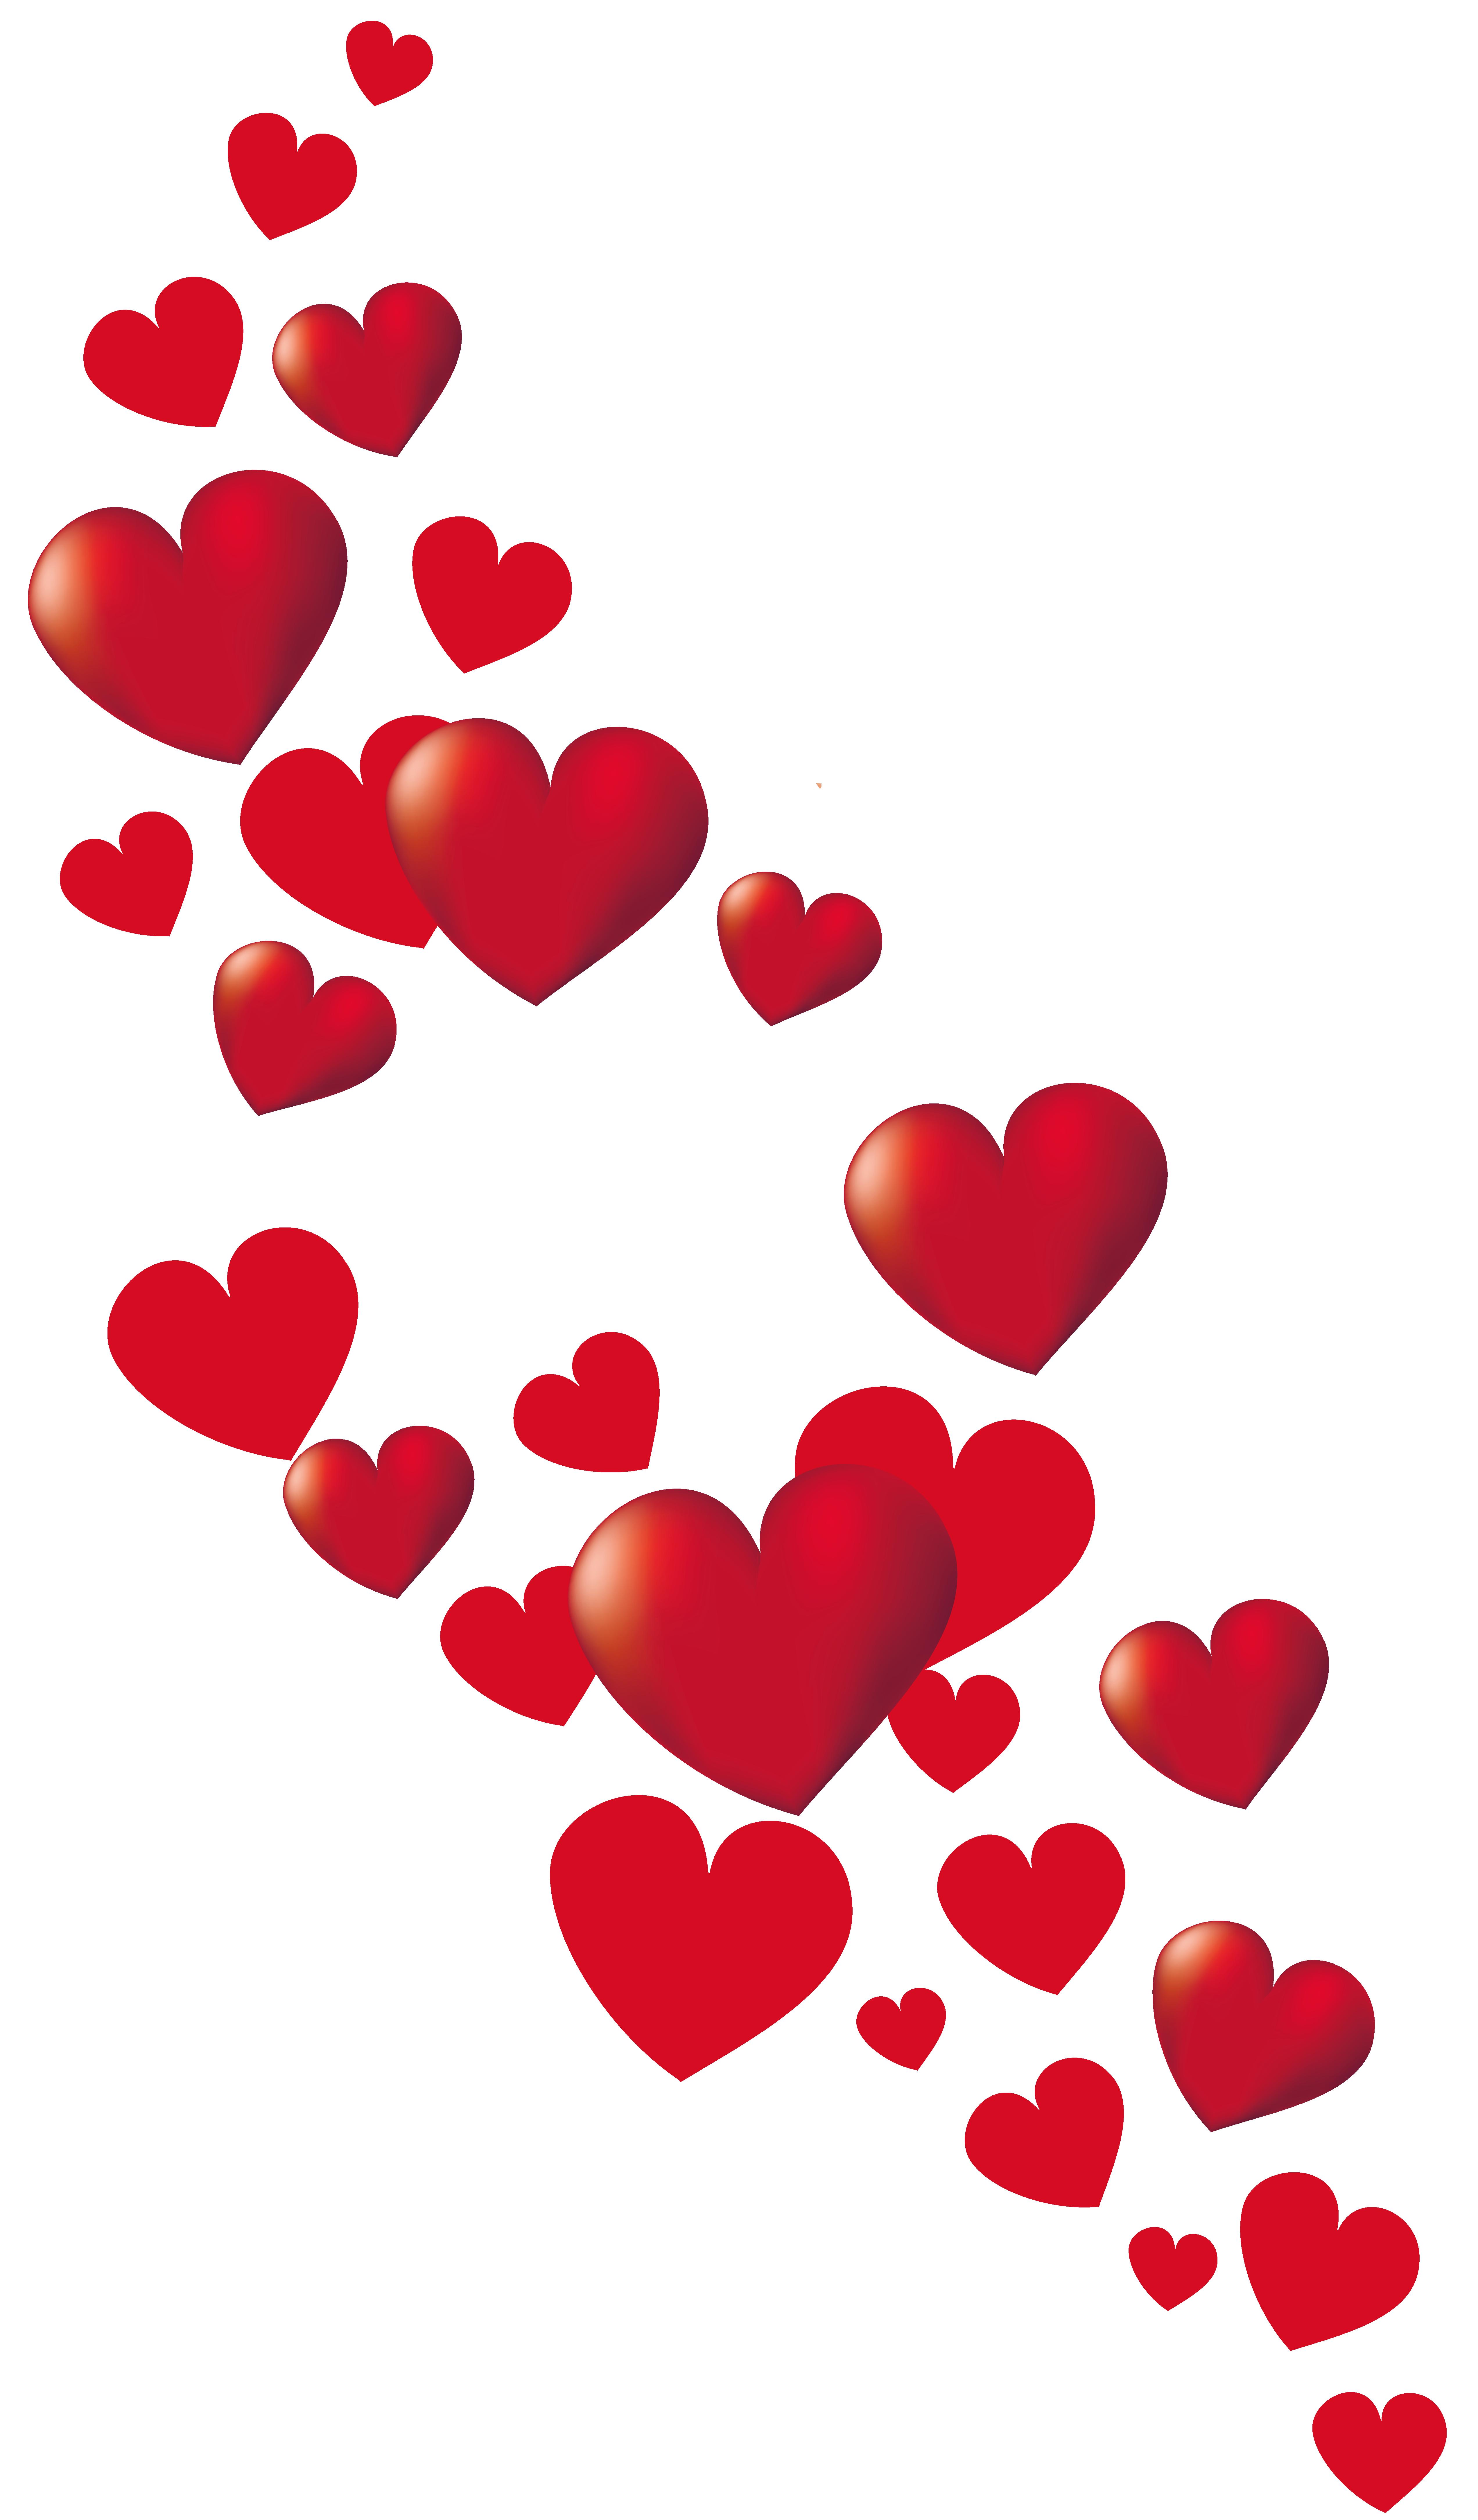 Valentine Hearts Decor PNG Clipart Picture.